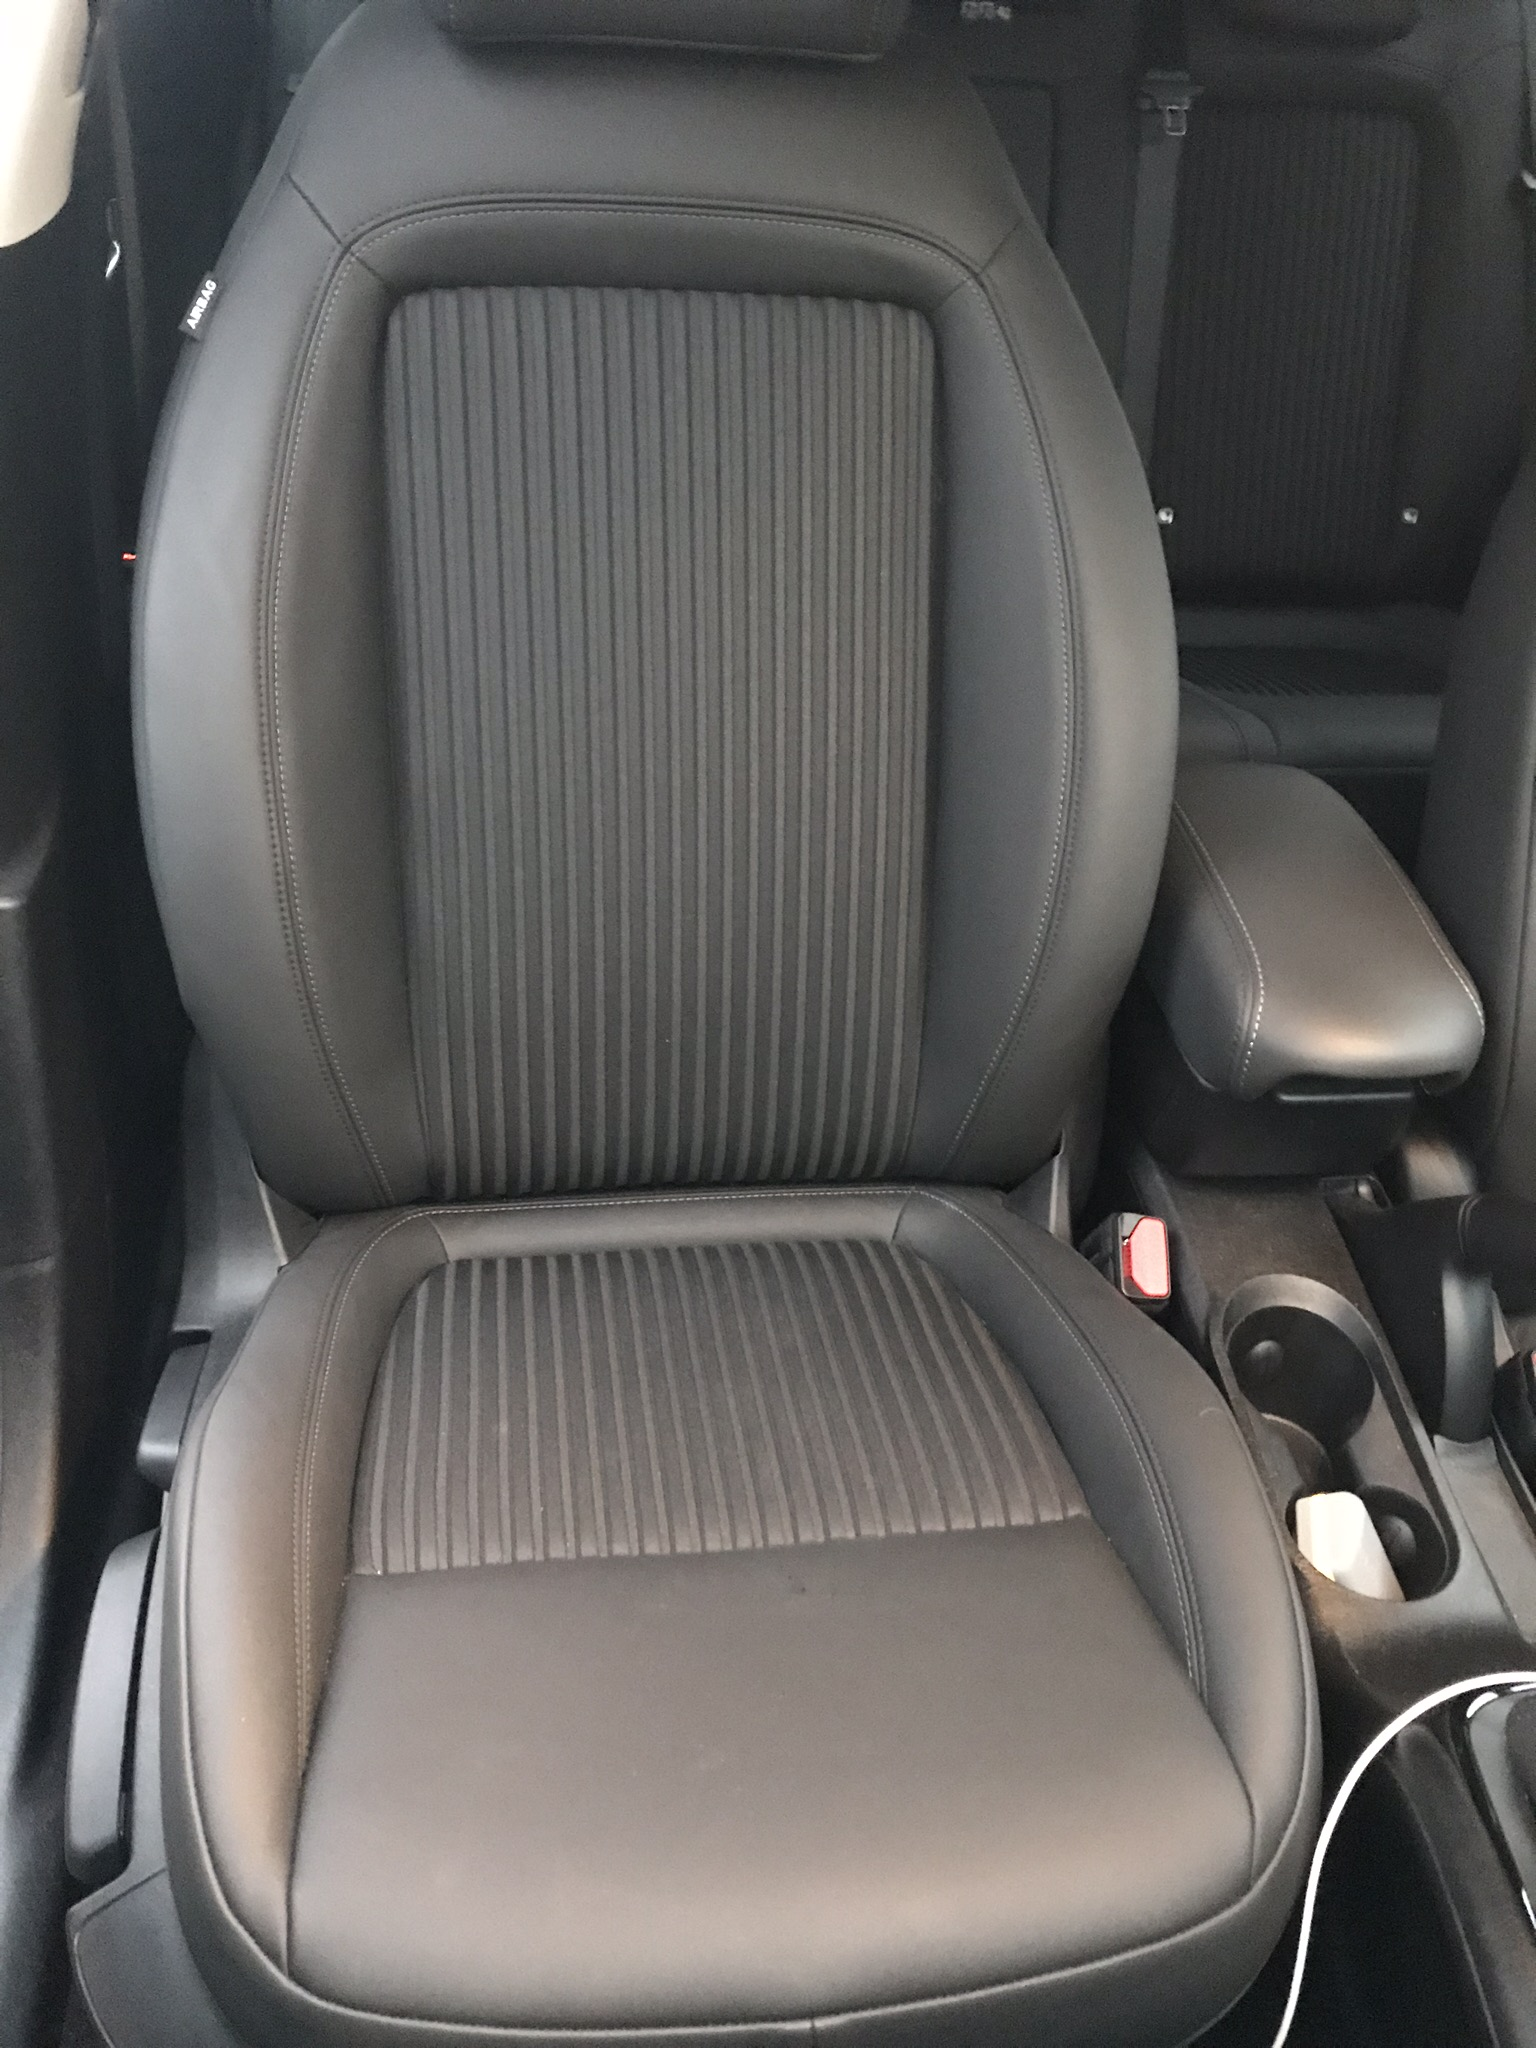 FIAT Tipo S-DESIGN 1.4 TJet